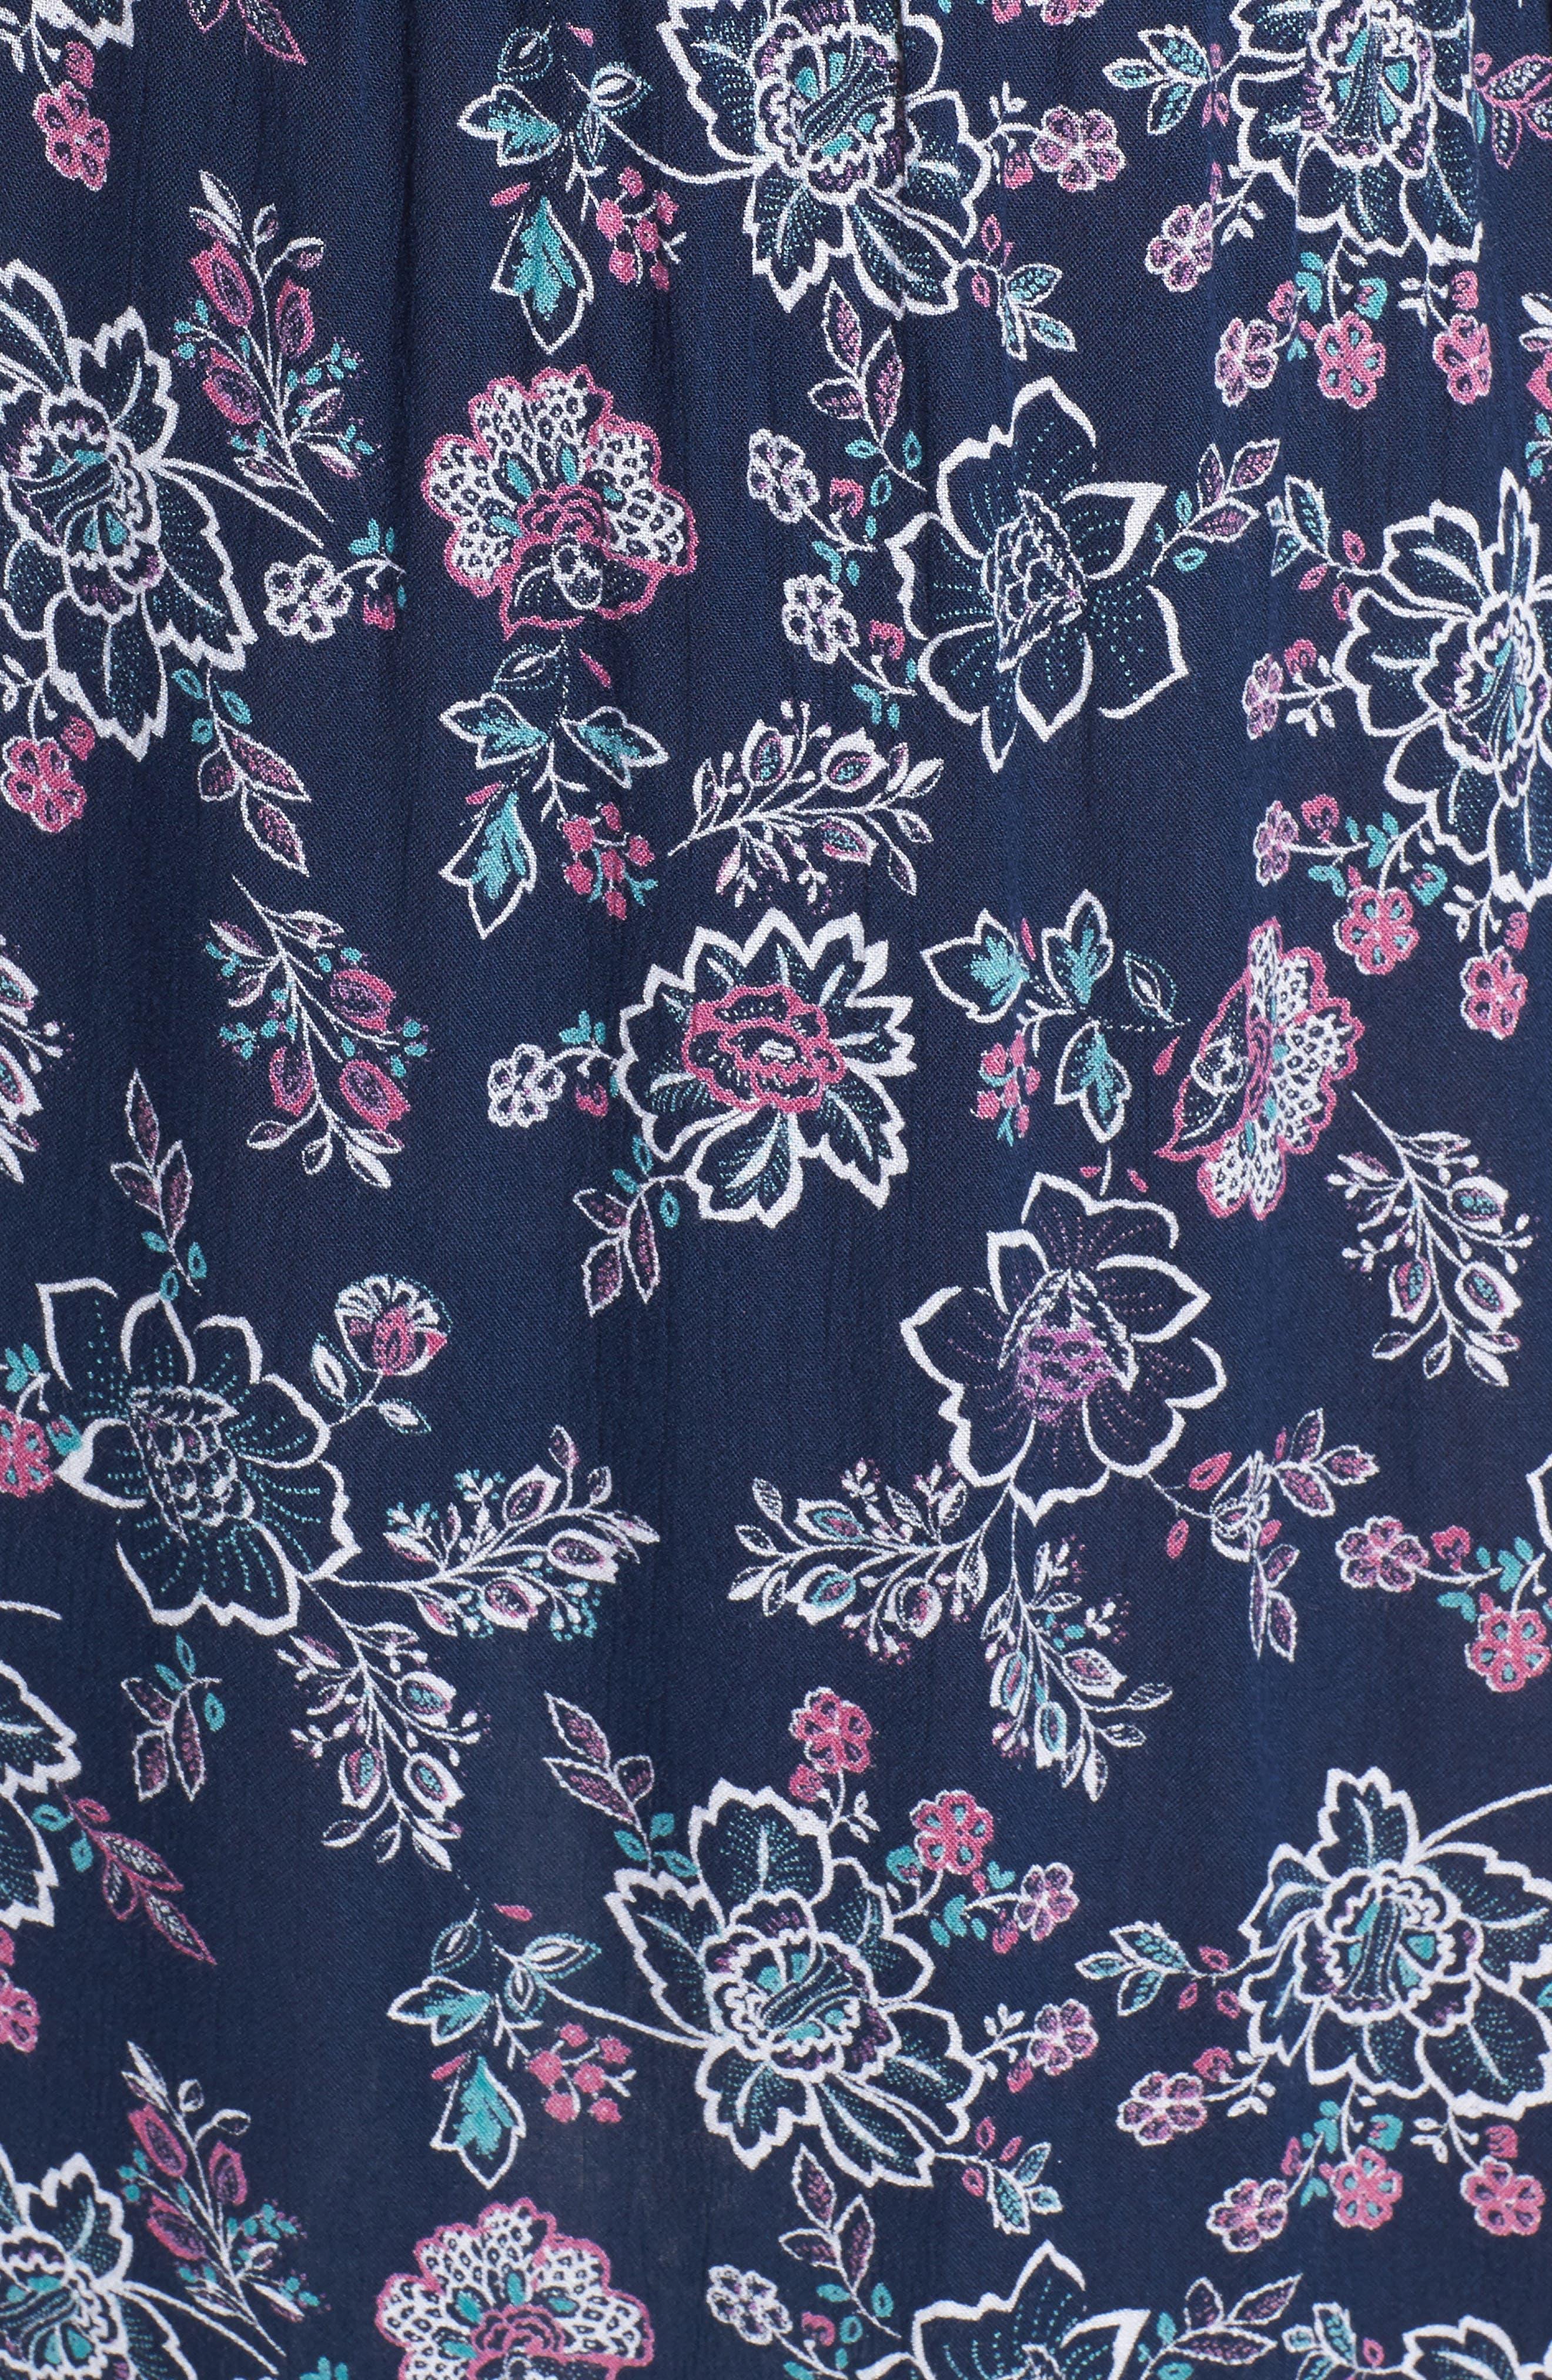 Floral Print Crochet Trim Dress,                             Alternate thumbnail 5, color,                             Navy